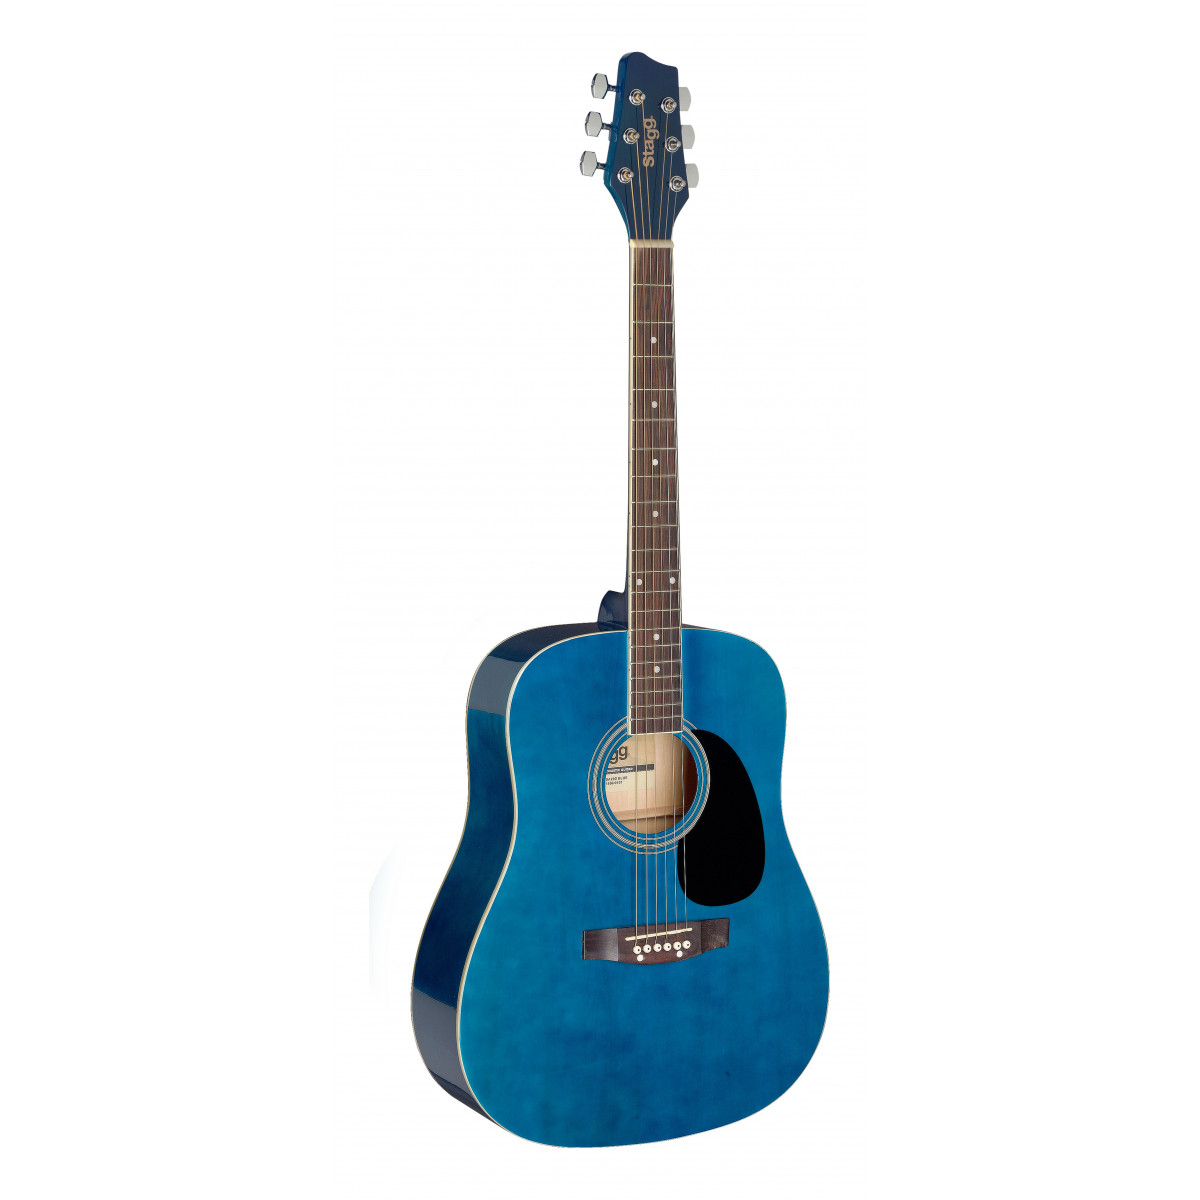 Guitare enfant 3/4 folk bleu